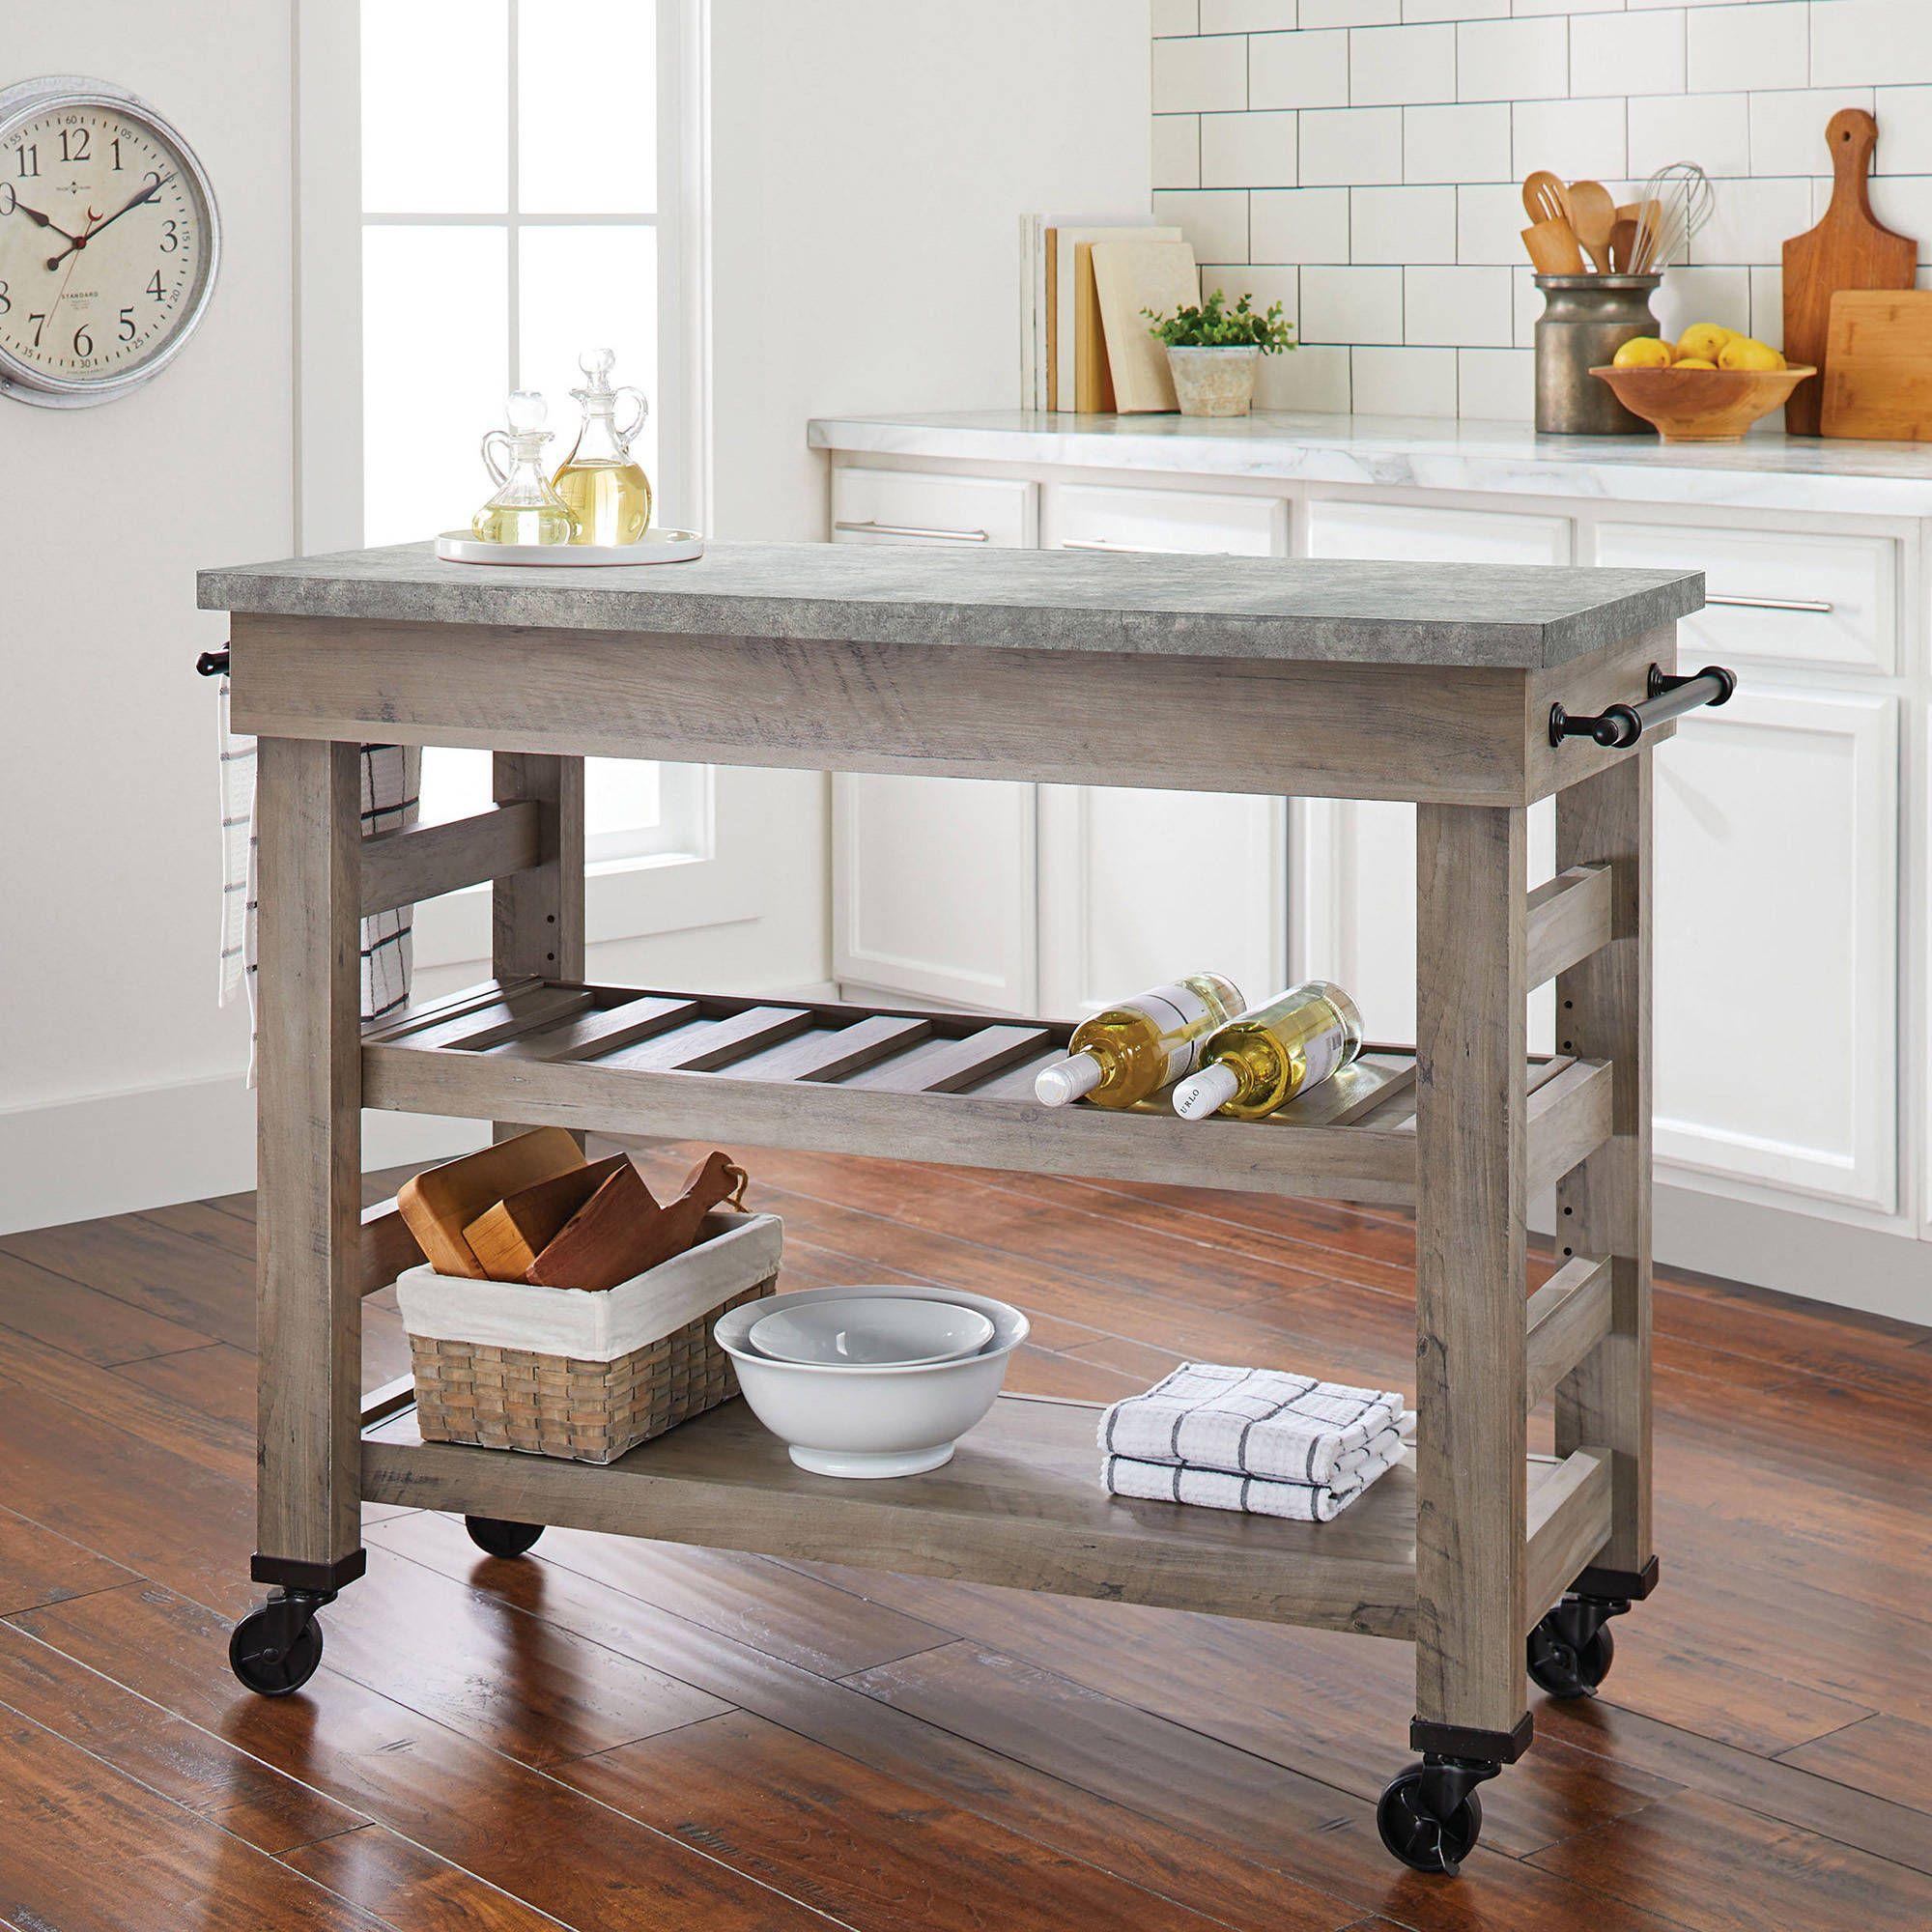 Best Modern Farm House Design Products From Walmart Home Decor Kitchen Farmhouse Kitchen Island Kitchen Remodel